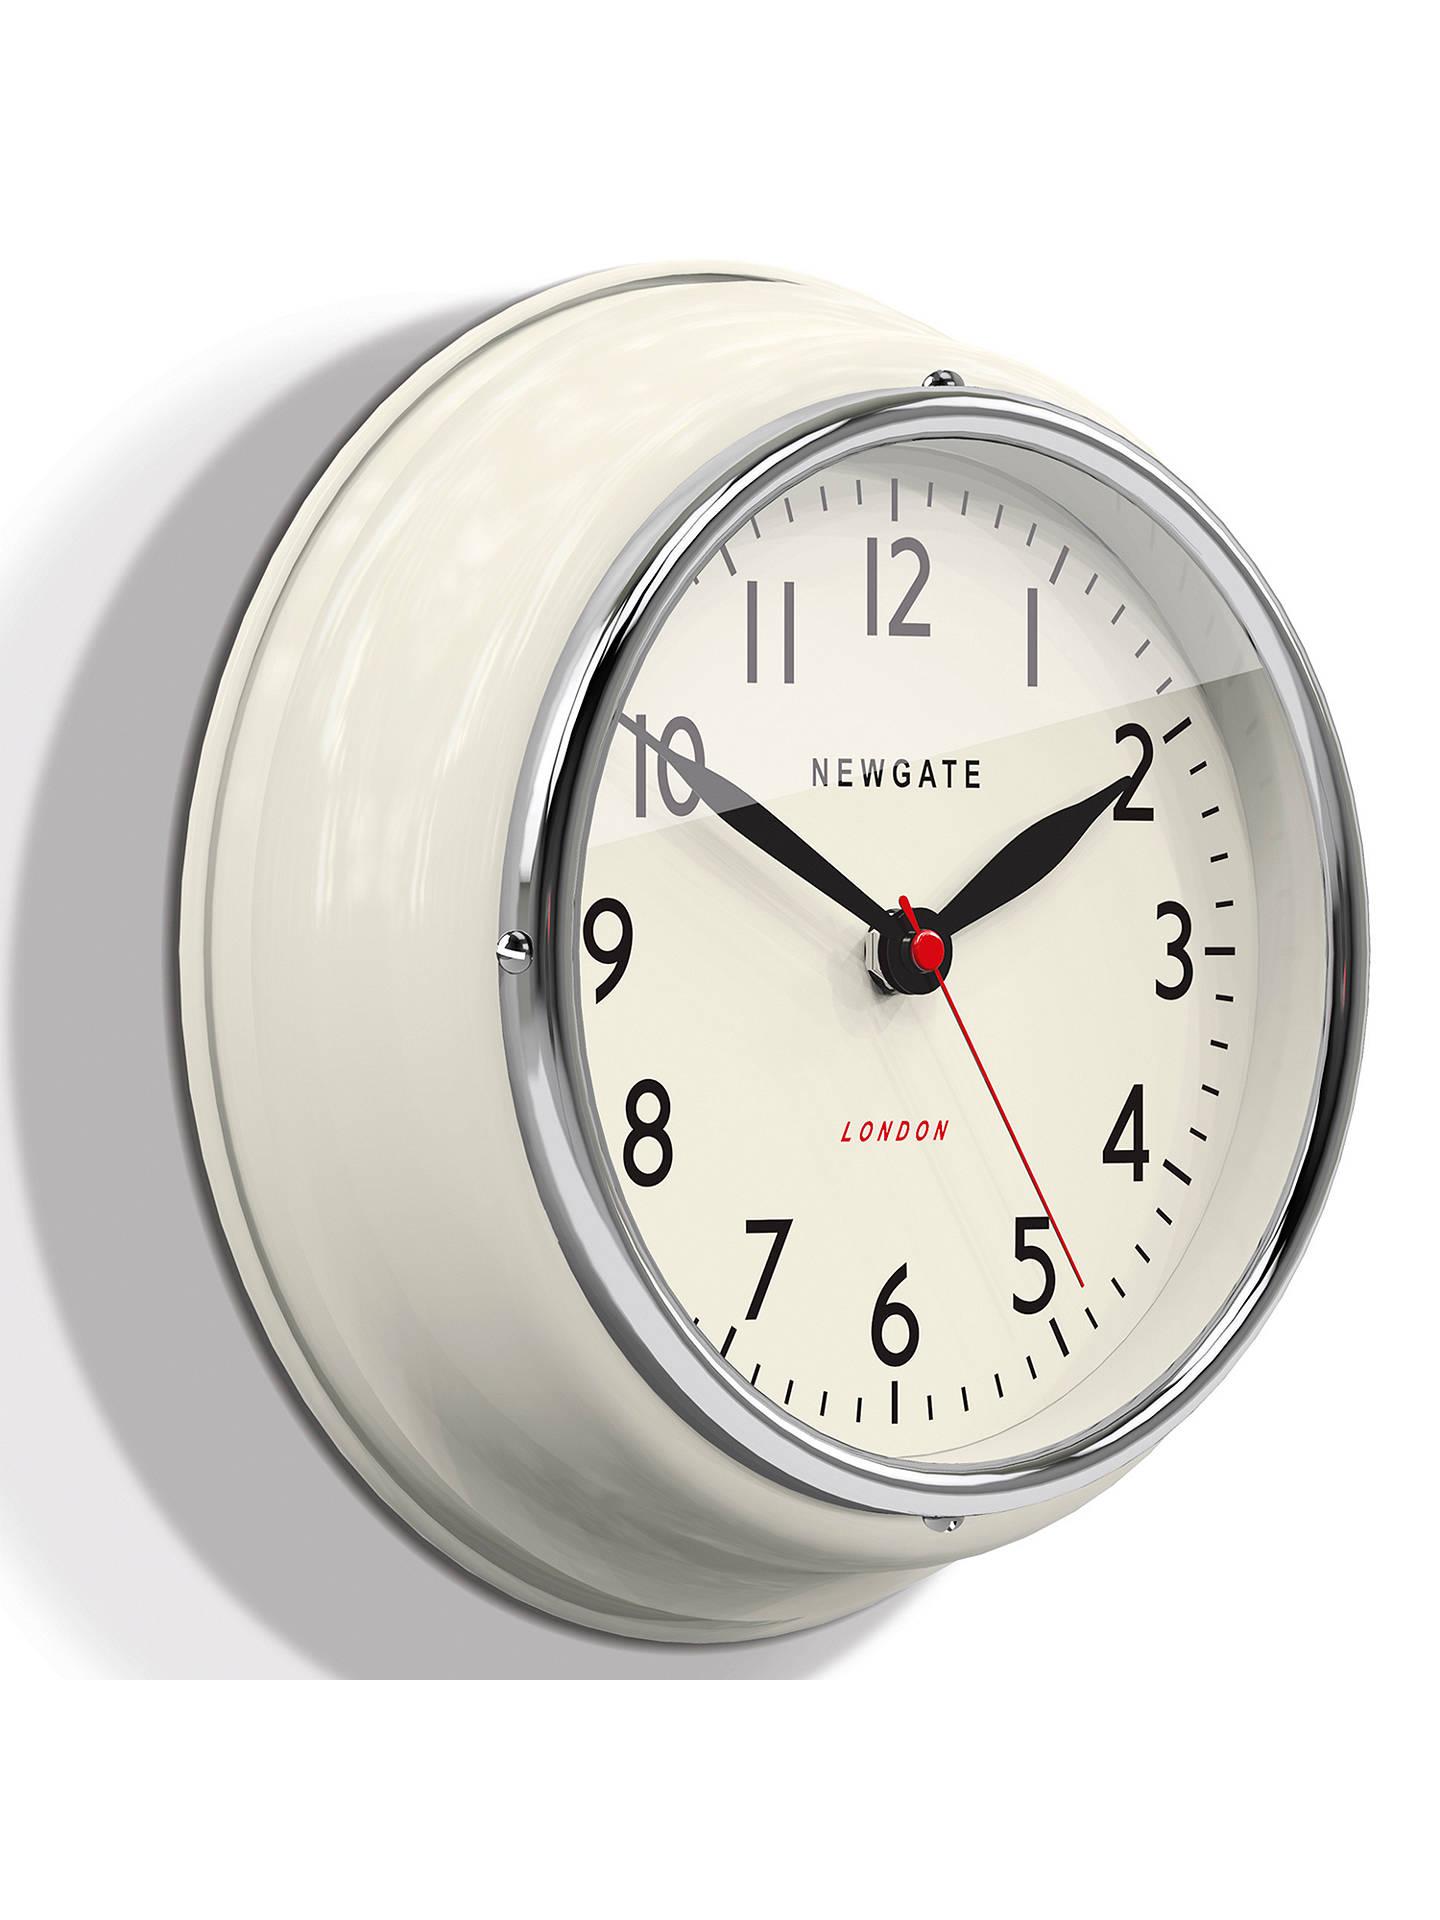 Newgate The Mini Cookhouse Clock Dia23cm At John Lewis Partners